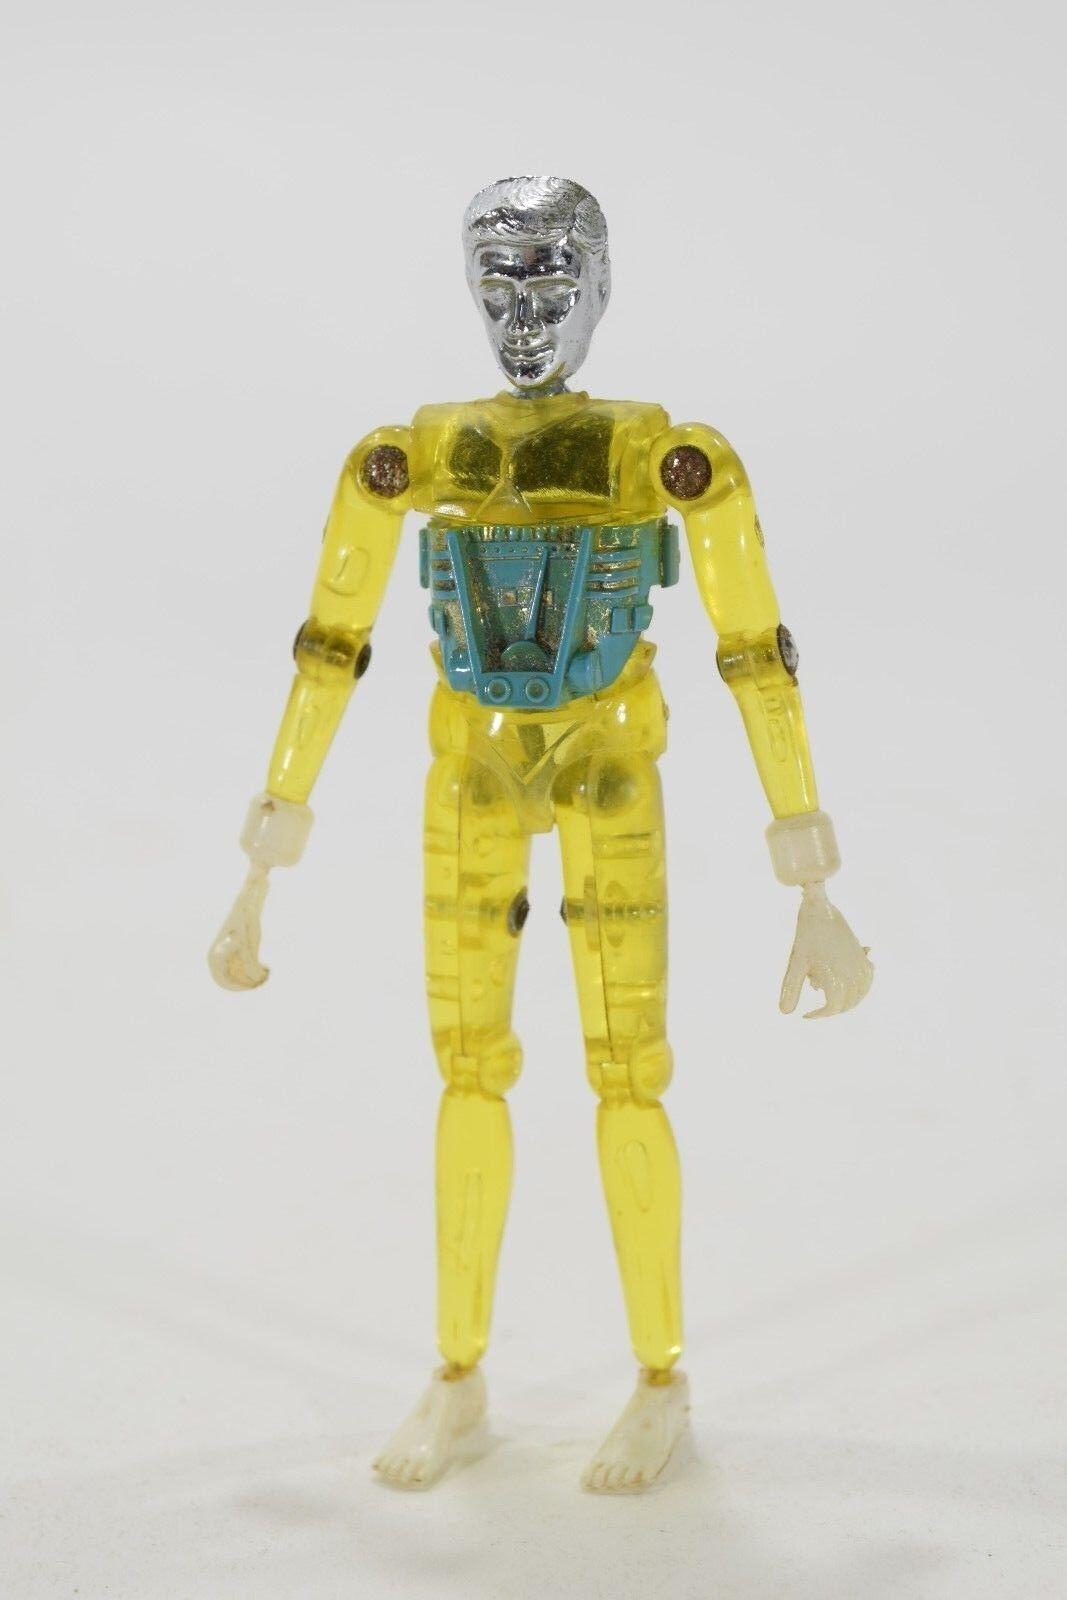 1974 takara vintage microman m101 serie gelb microman barfuß modell abbildung